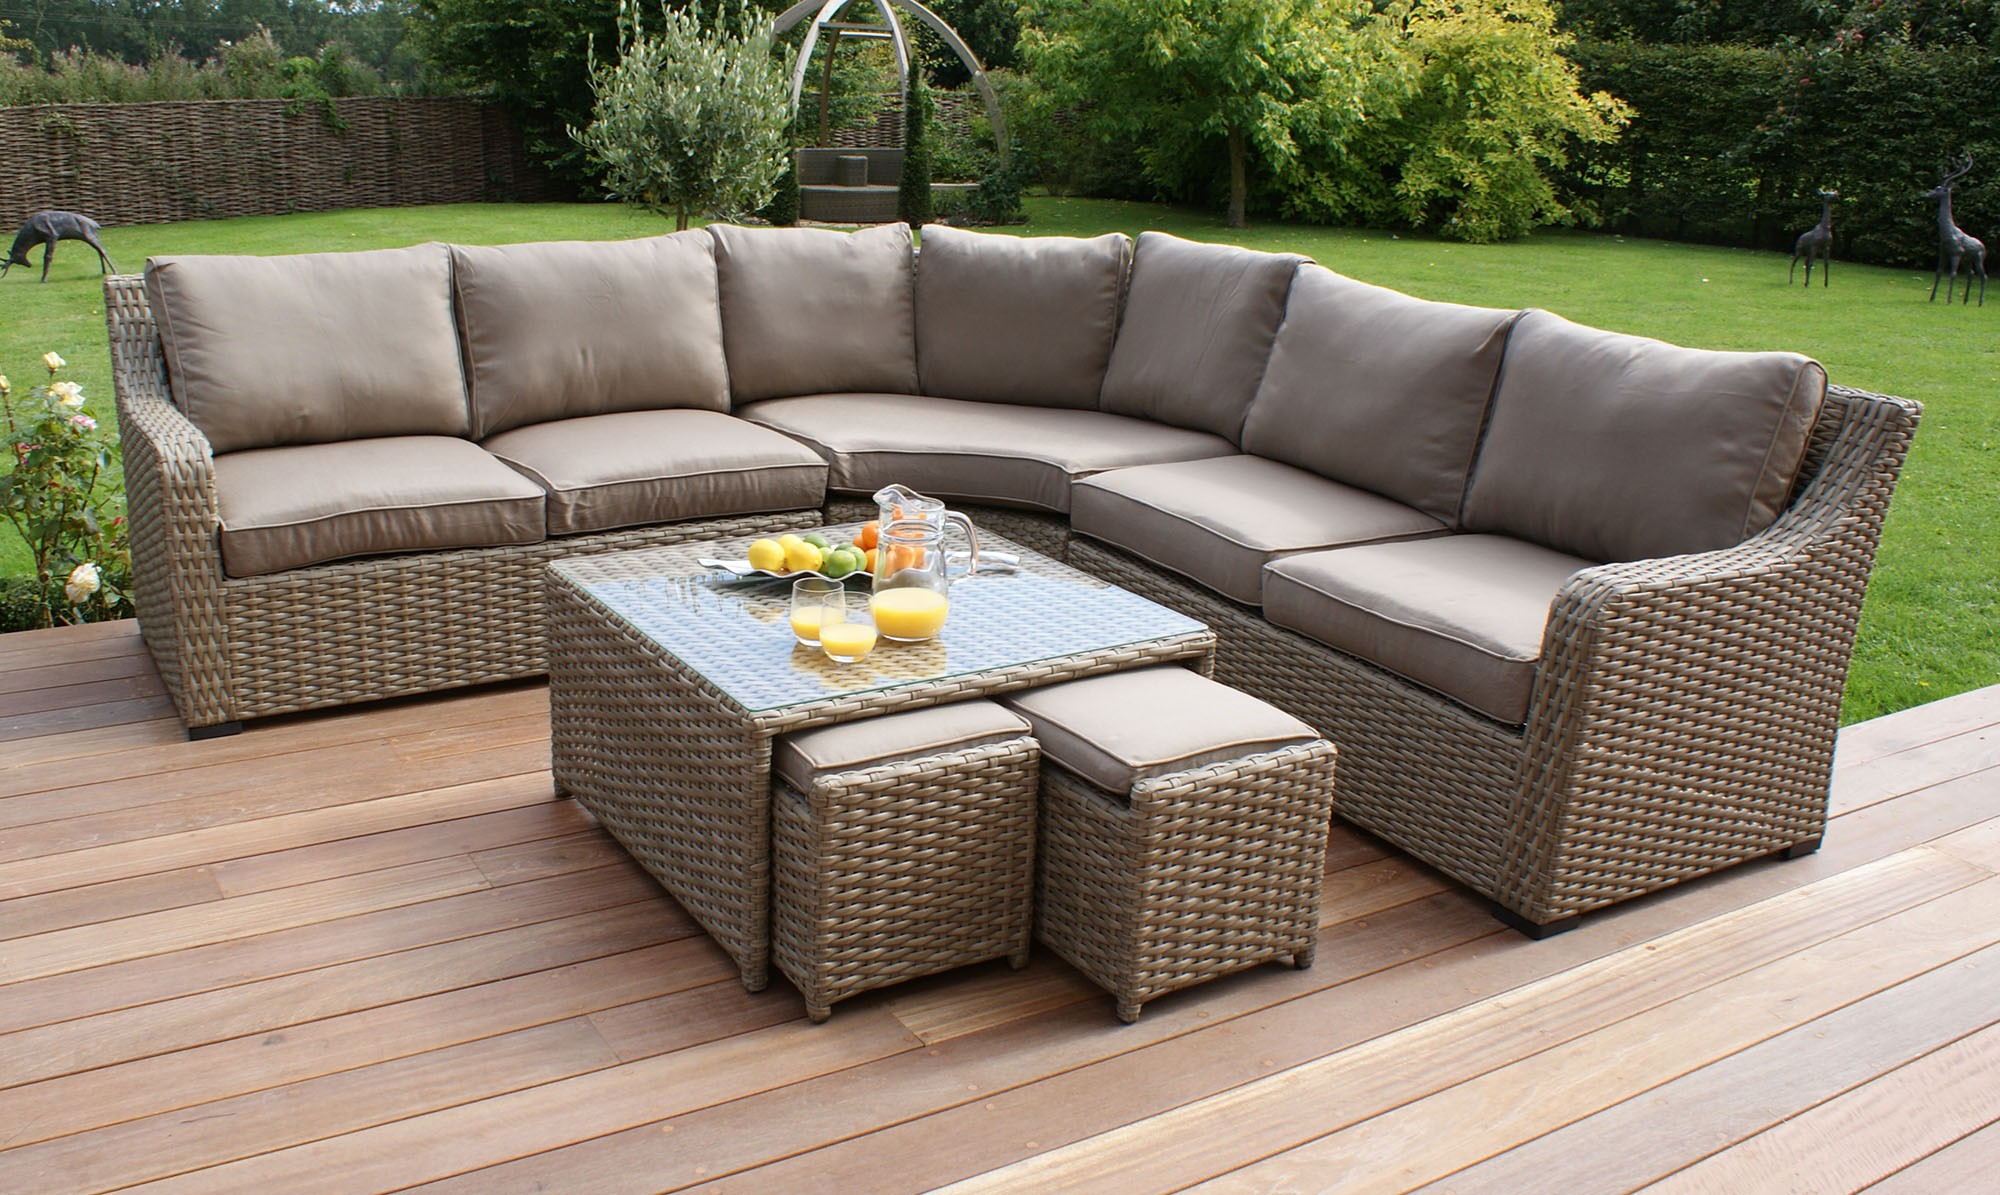 wicker garden furniture rattan garden sofas \u0026 sofa sets for your garden RZHKPAI